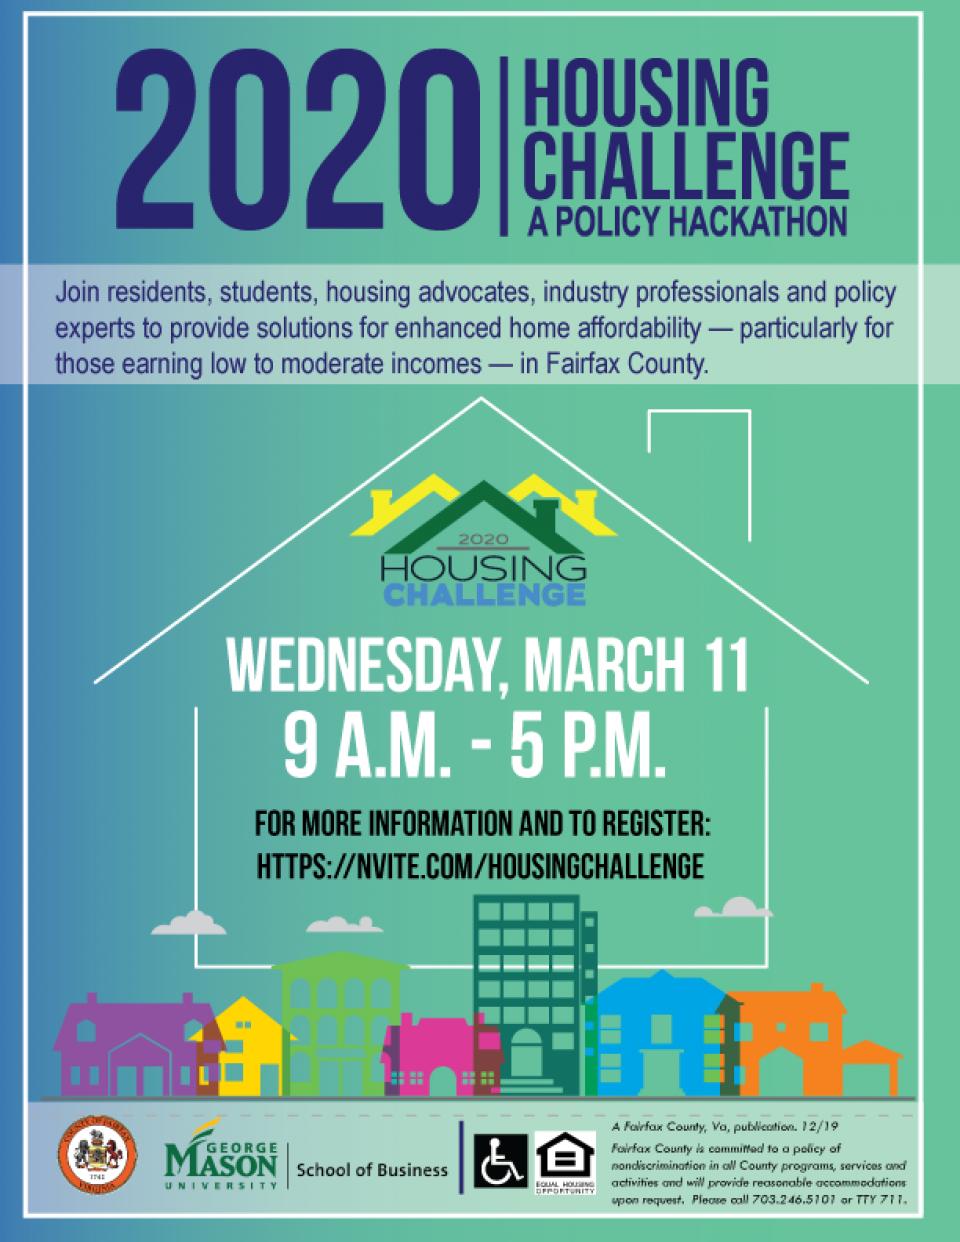 2020 Housing Challenge Flyer – Image